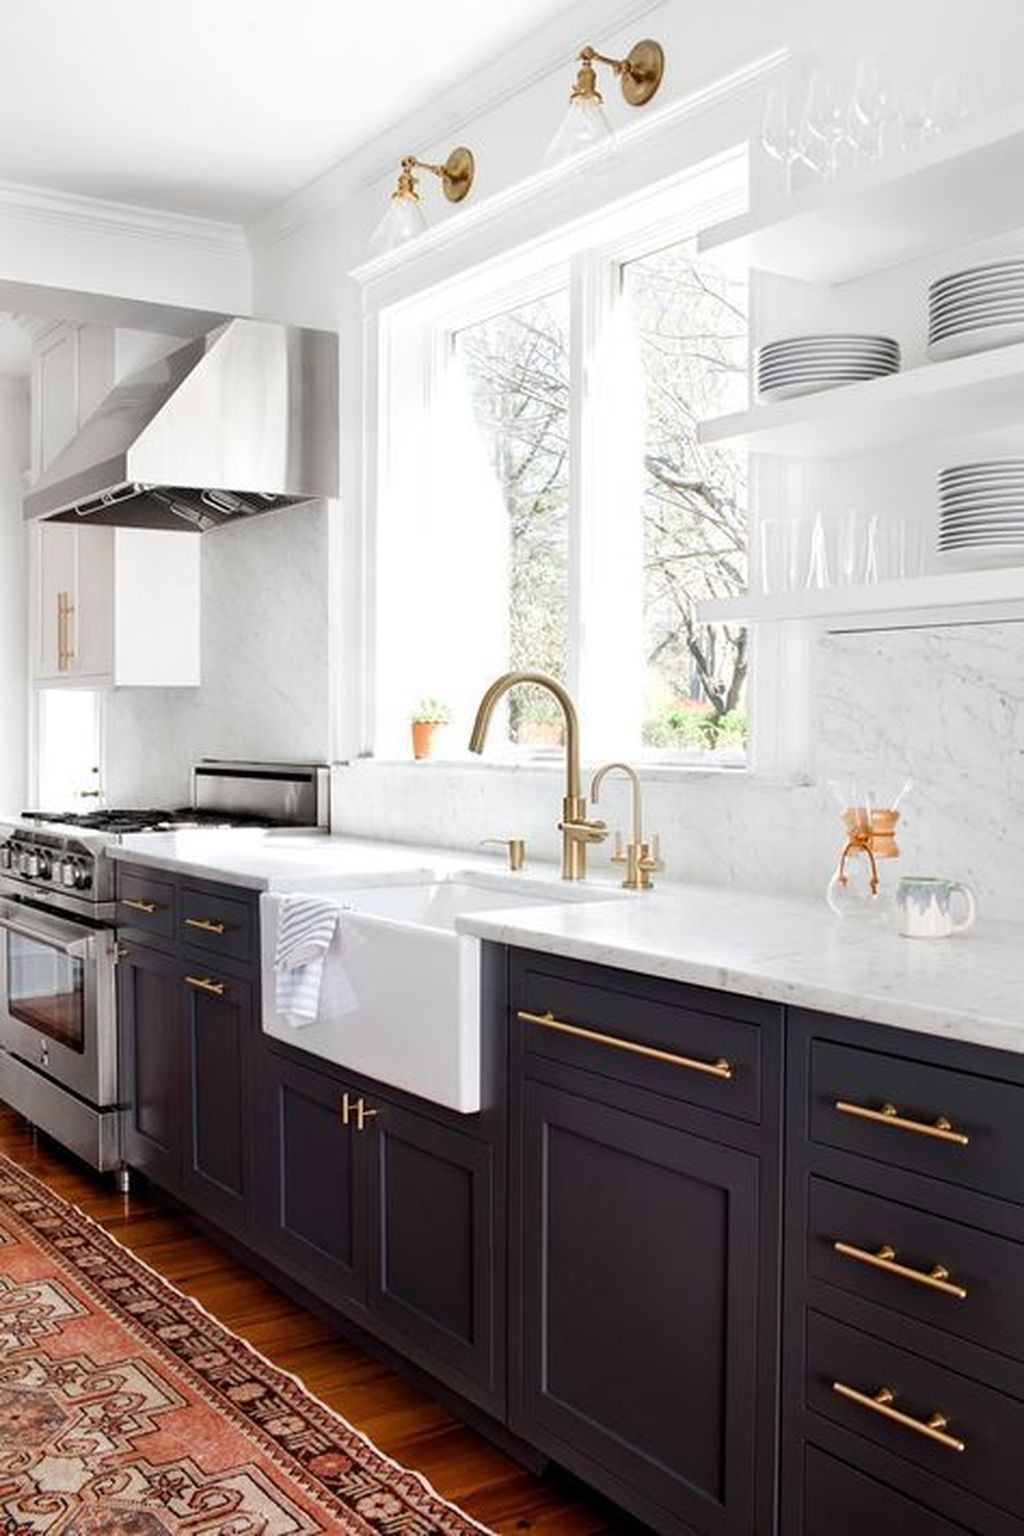 Awesome White Kitchen Cabinets Decor Ideas future home